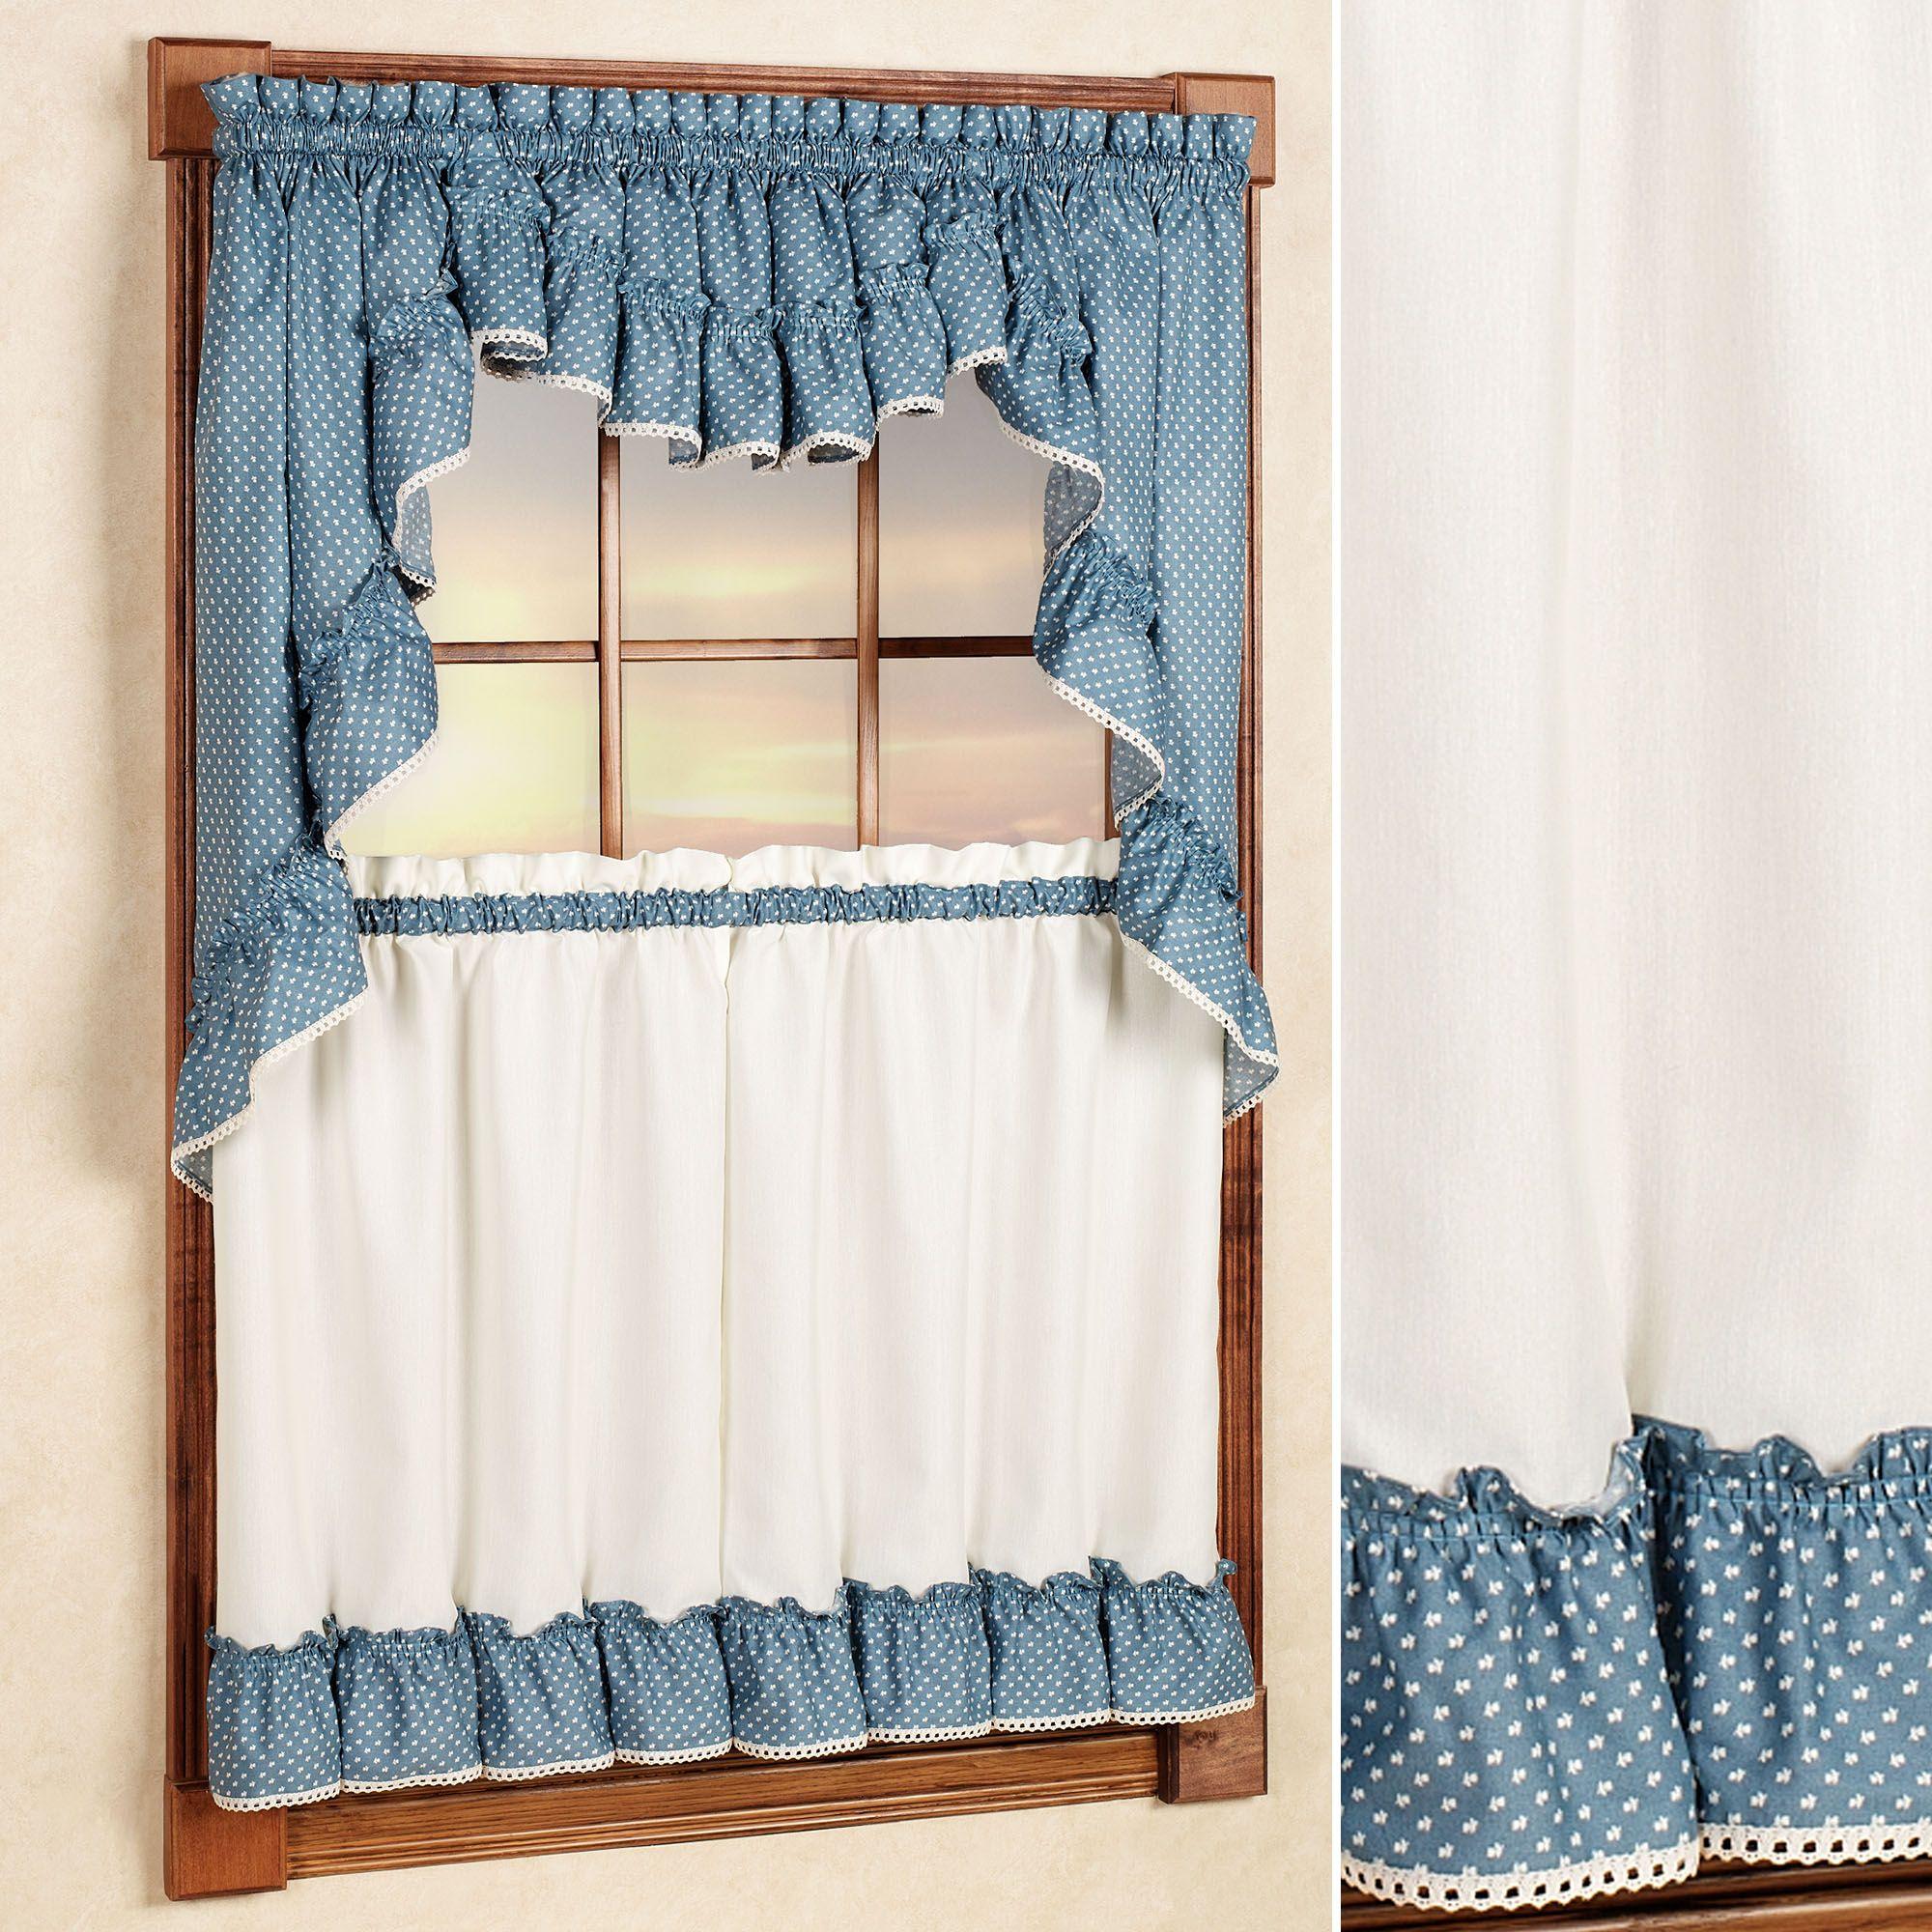 Sturbridge Curtain Tiers